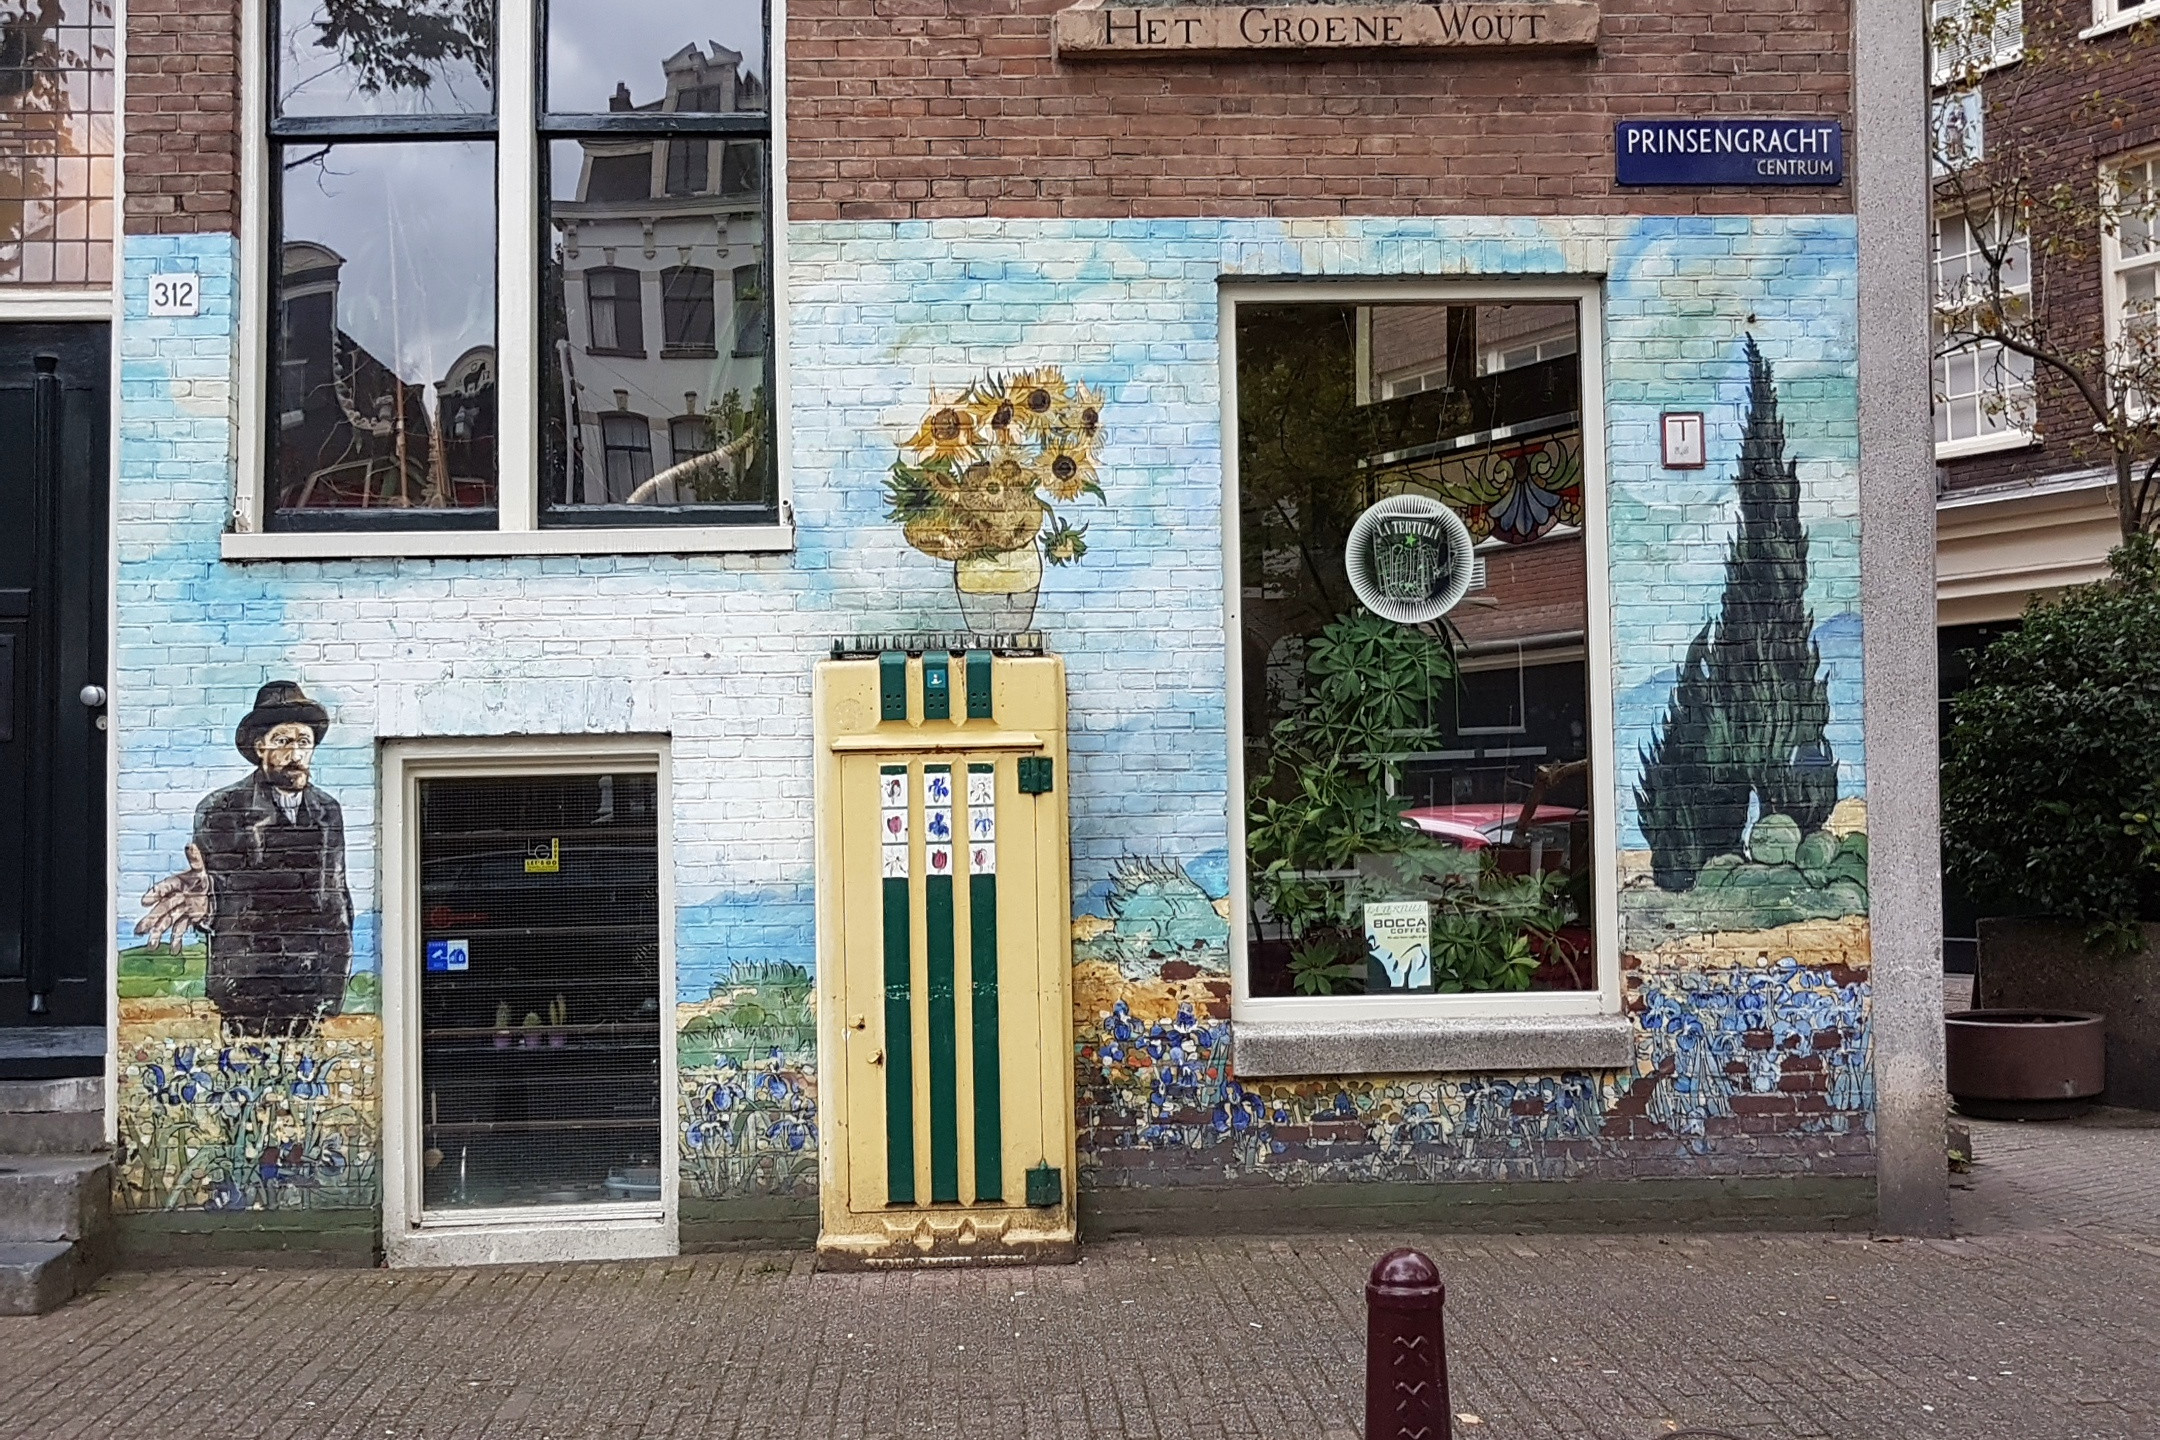 Van Gogh on Princengracht